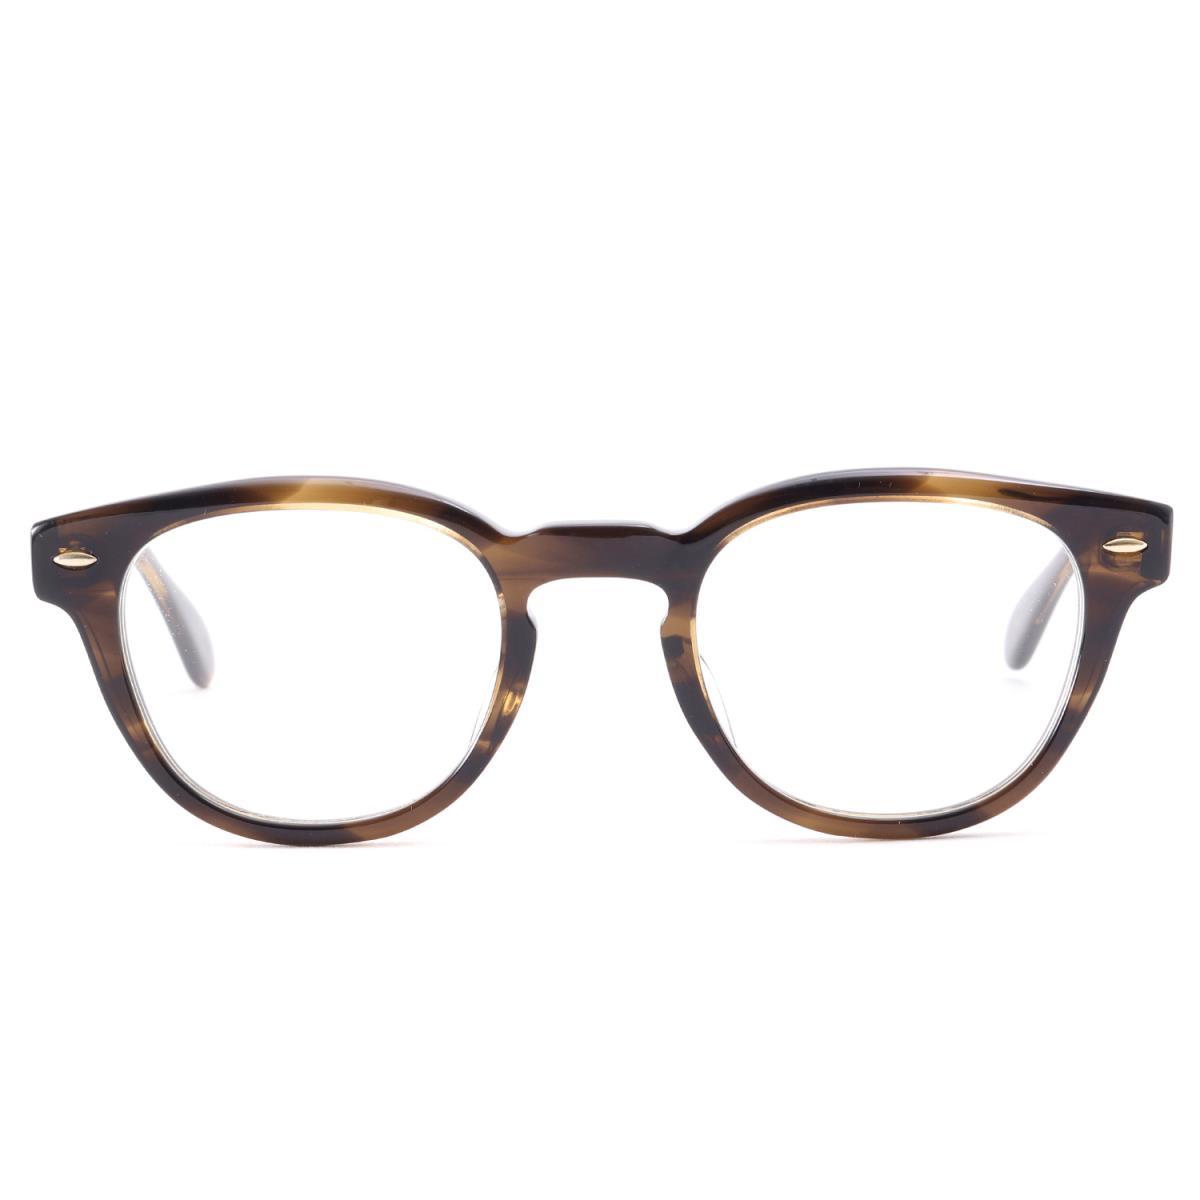 OLIVER PEOPLES (オリバー ピープルズ) クリアレンズサングラス(Sheldrake-J) 眼鏡 日本製 べっ甲ブラウン×クリアレンズ 47□22-145 【メンズ】【K2207】【中古】【あす楽☆対応可】